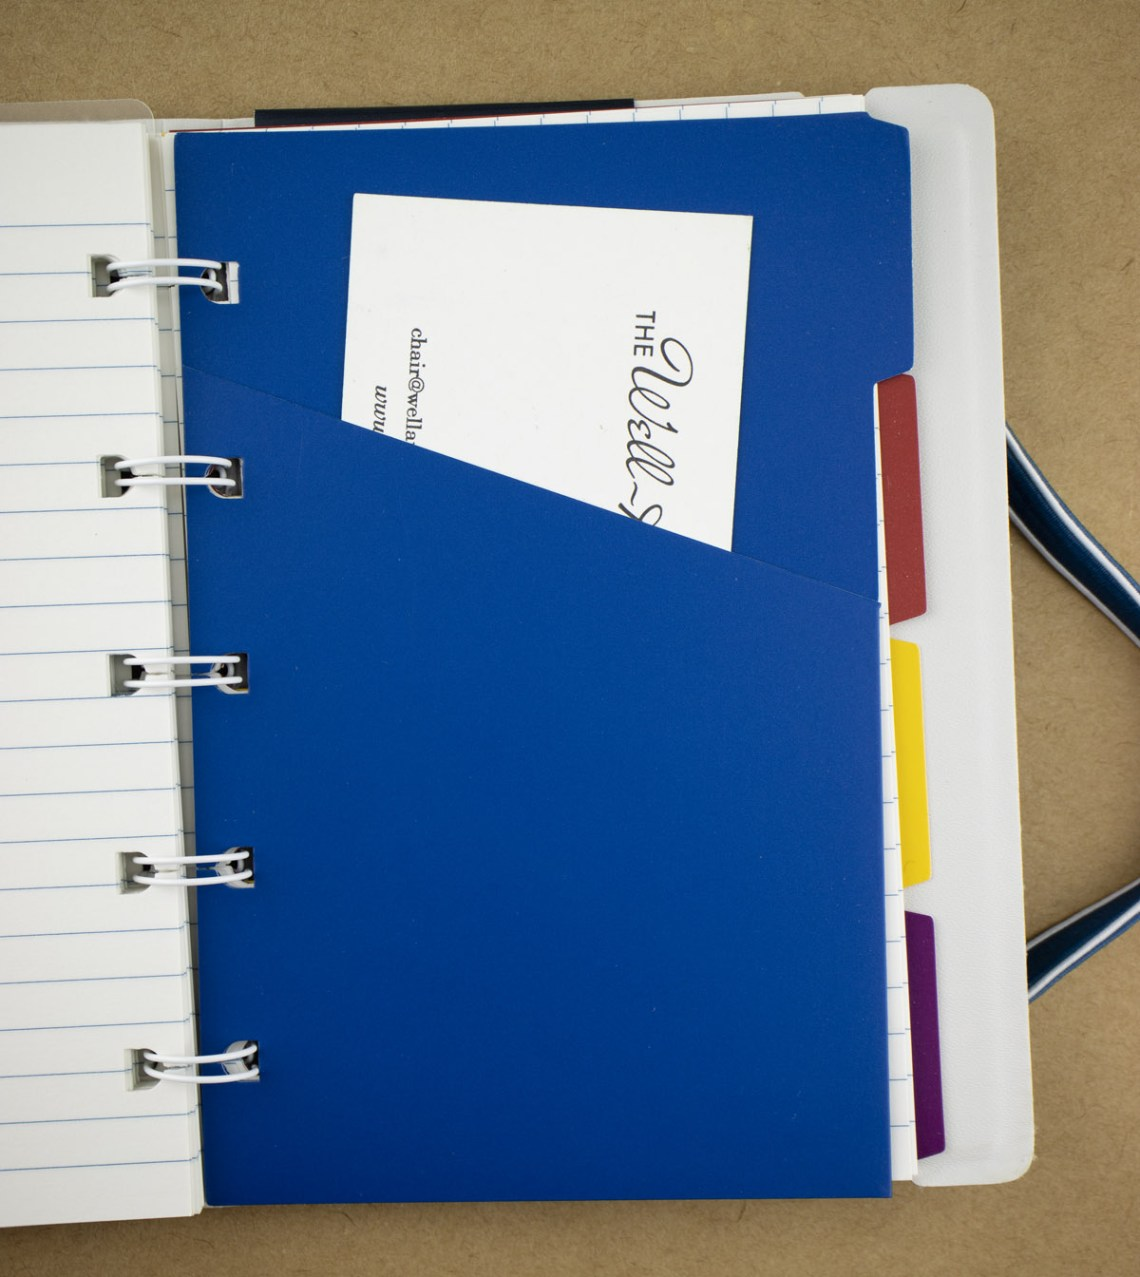 Filofax Impressions Notebook plastic divider